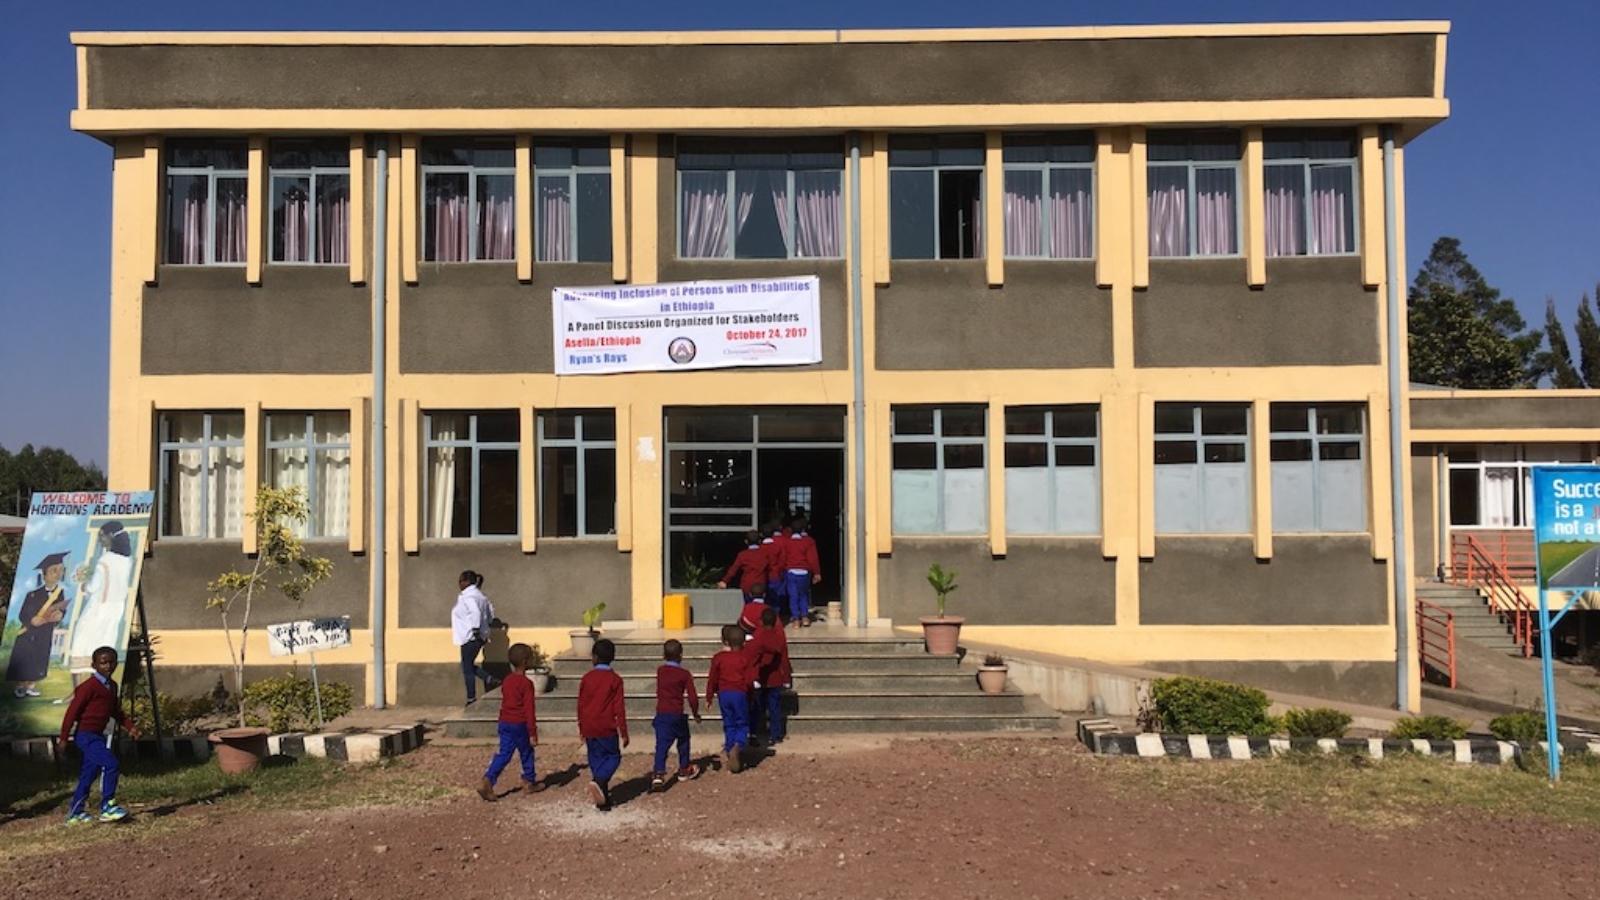 Horizons Academy